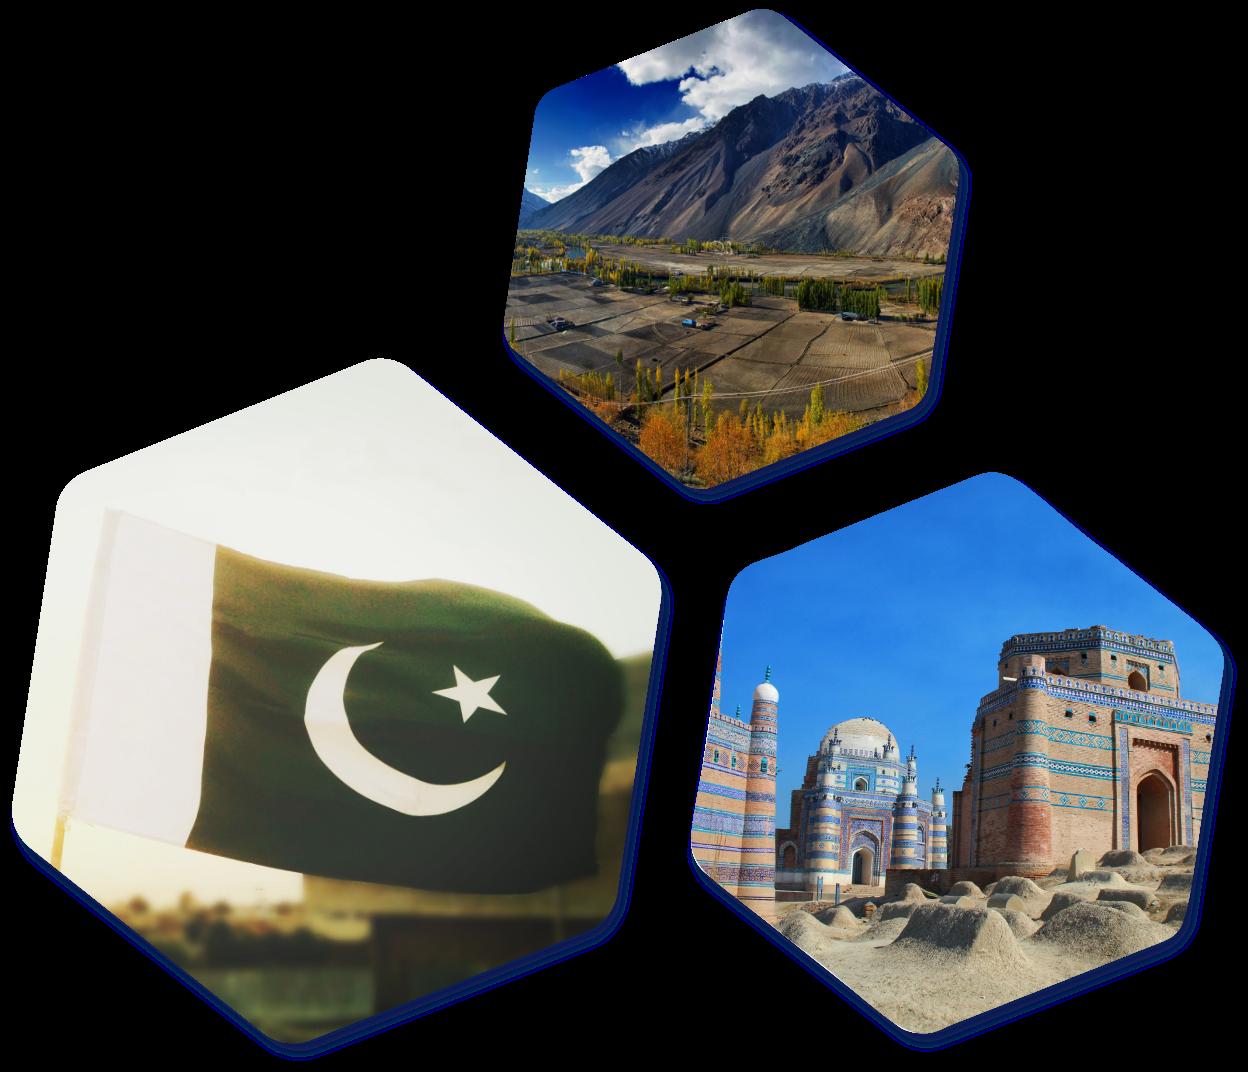 Hexagon Pakistan images